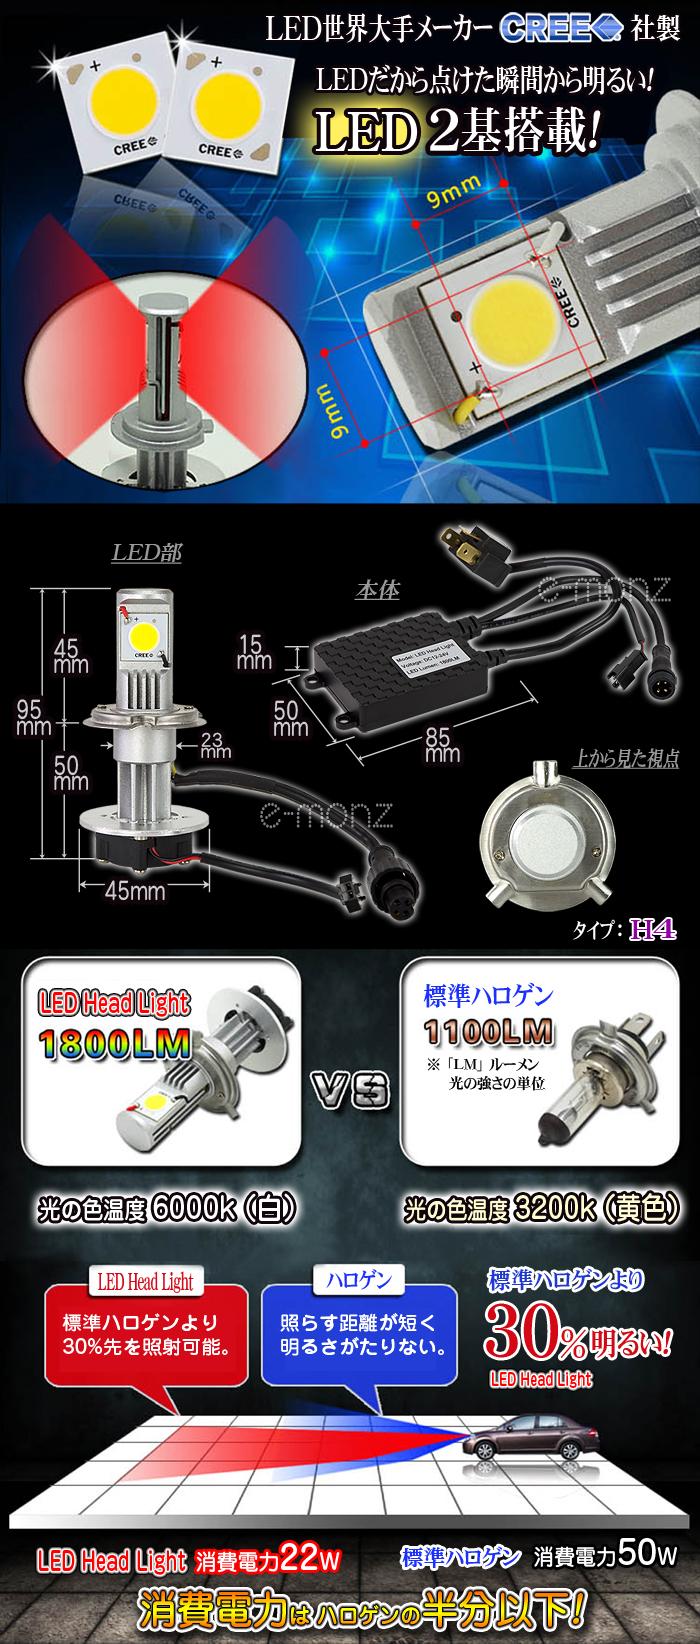 LEDヘッドライト用バルブ H4タイプ チップはCREE製を仕様なので安心